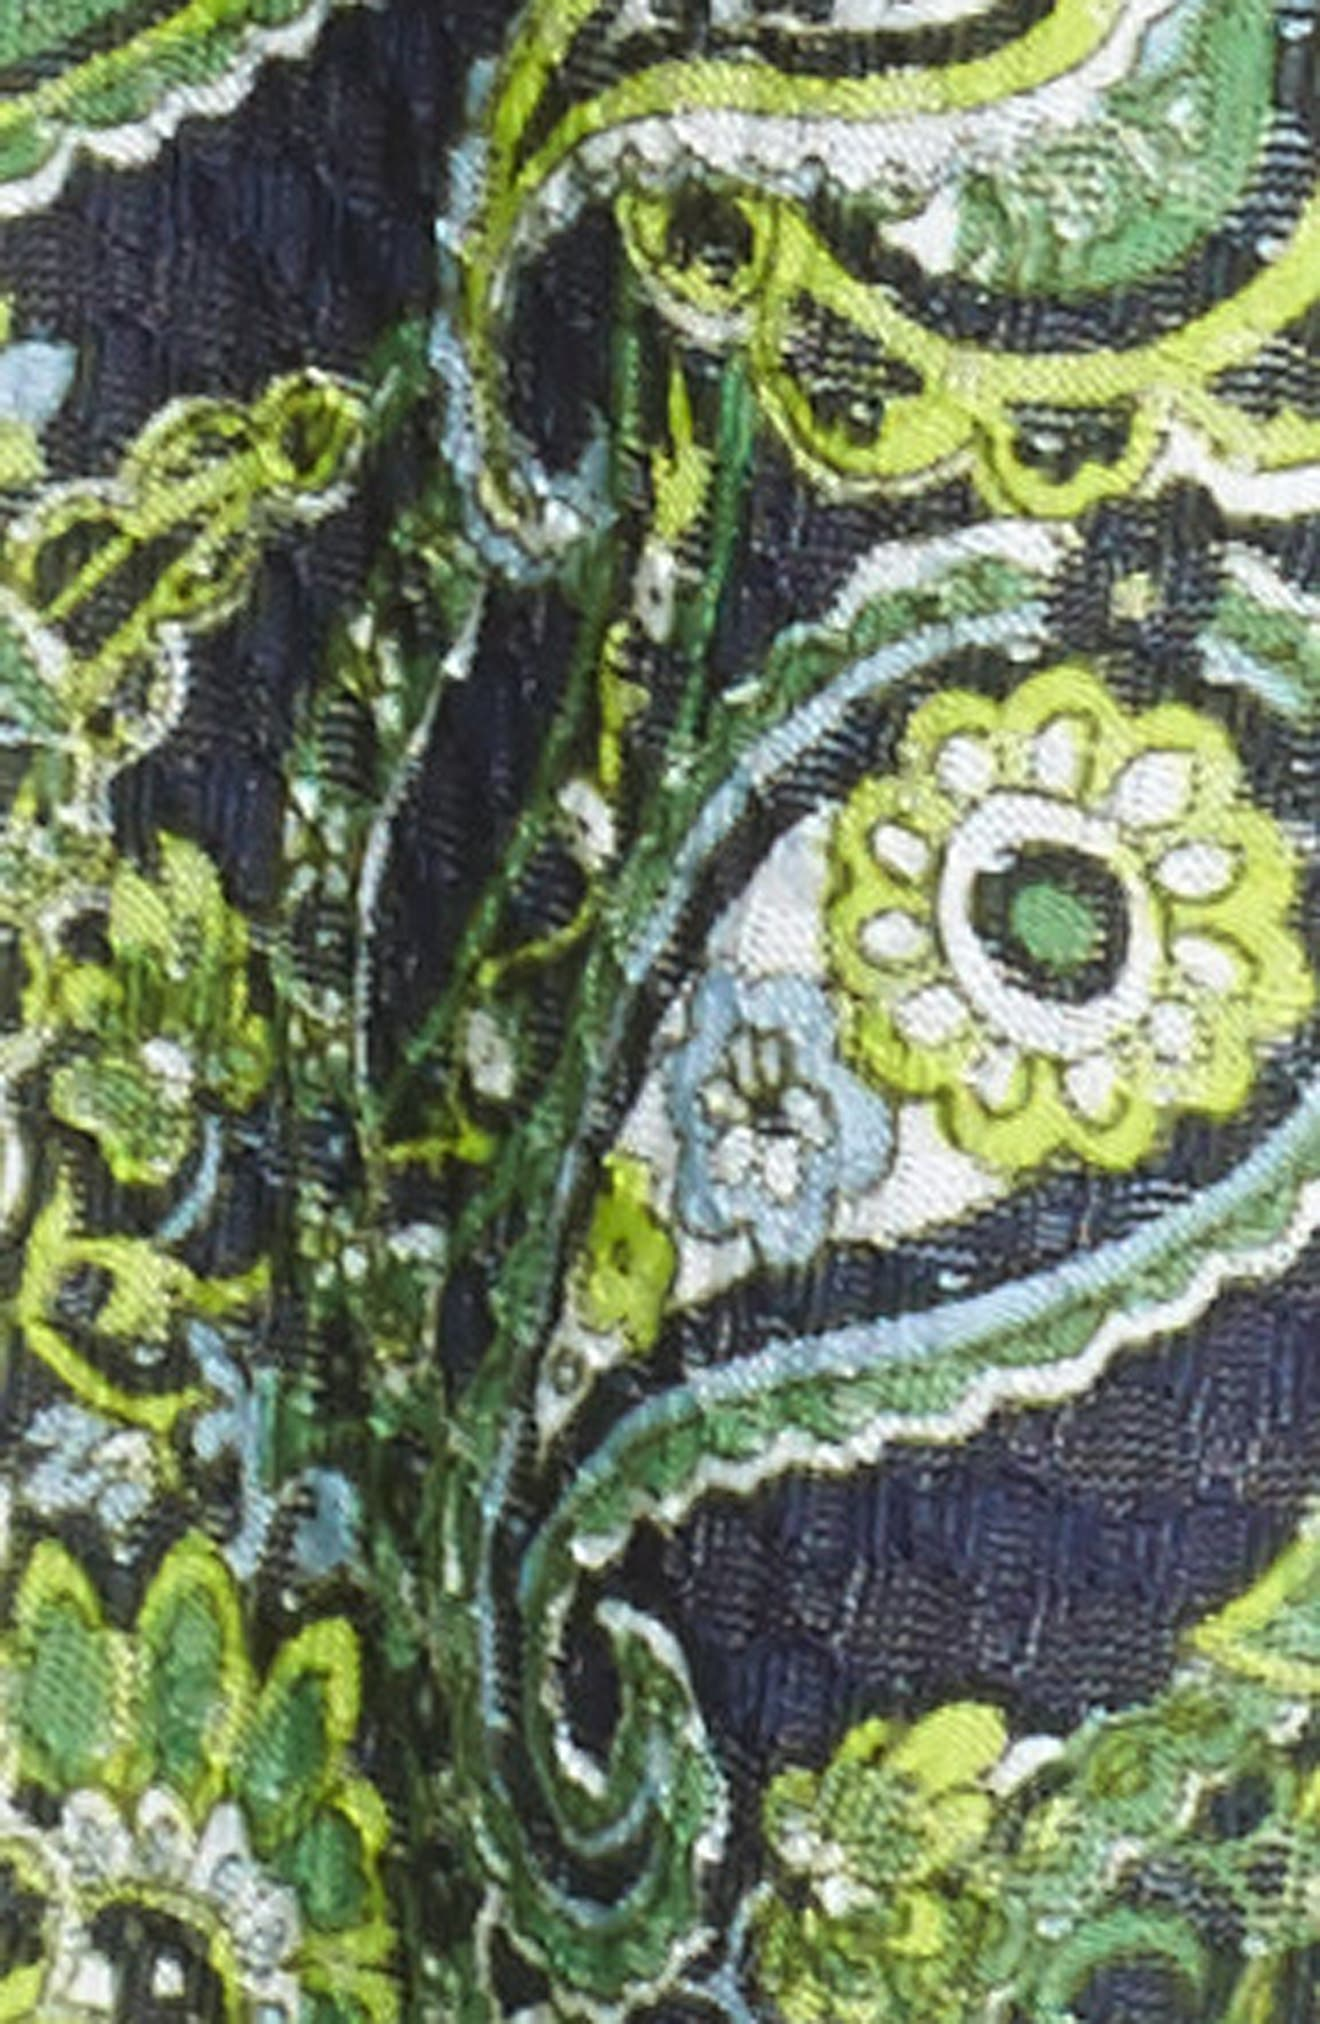 Pais Tier Sleeve Blouse,                             Alternate thumbnail 5, color,                             True Navy/ Green Apple Mu